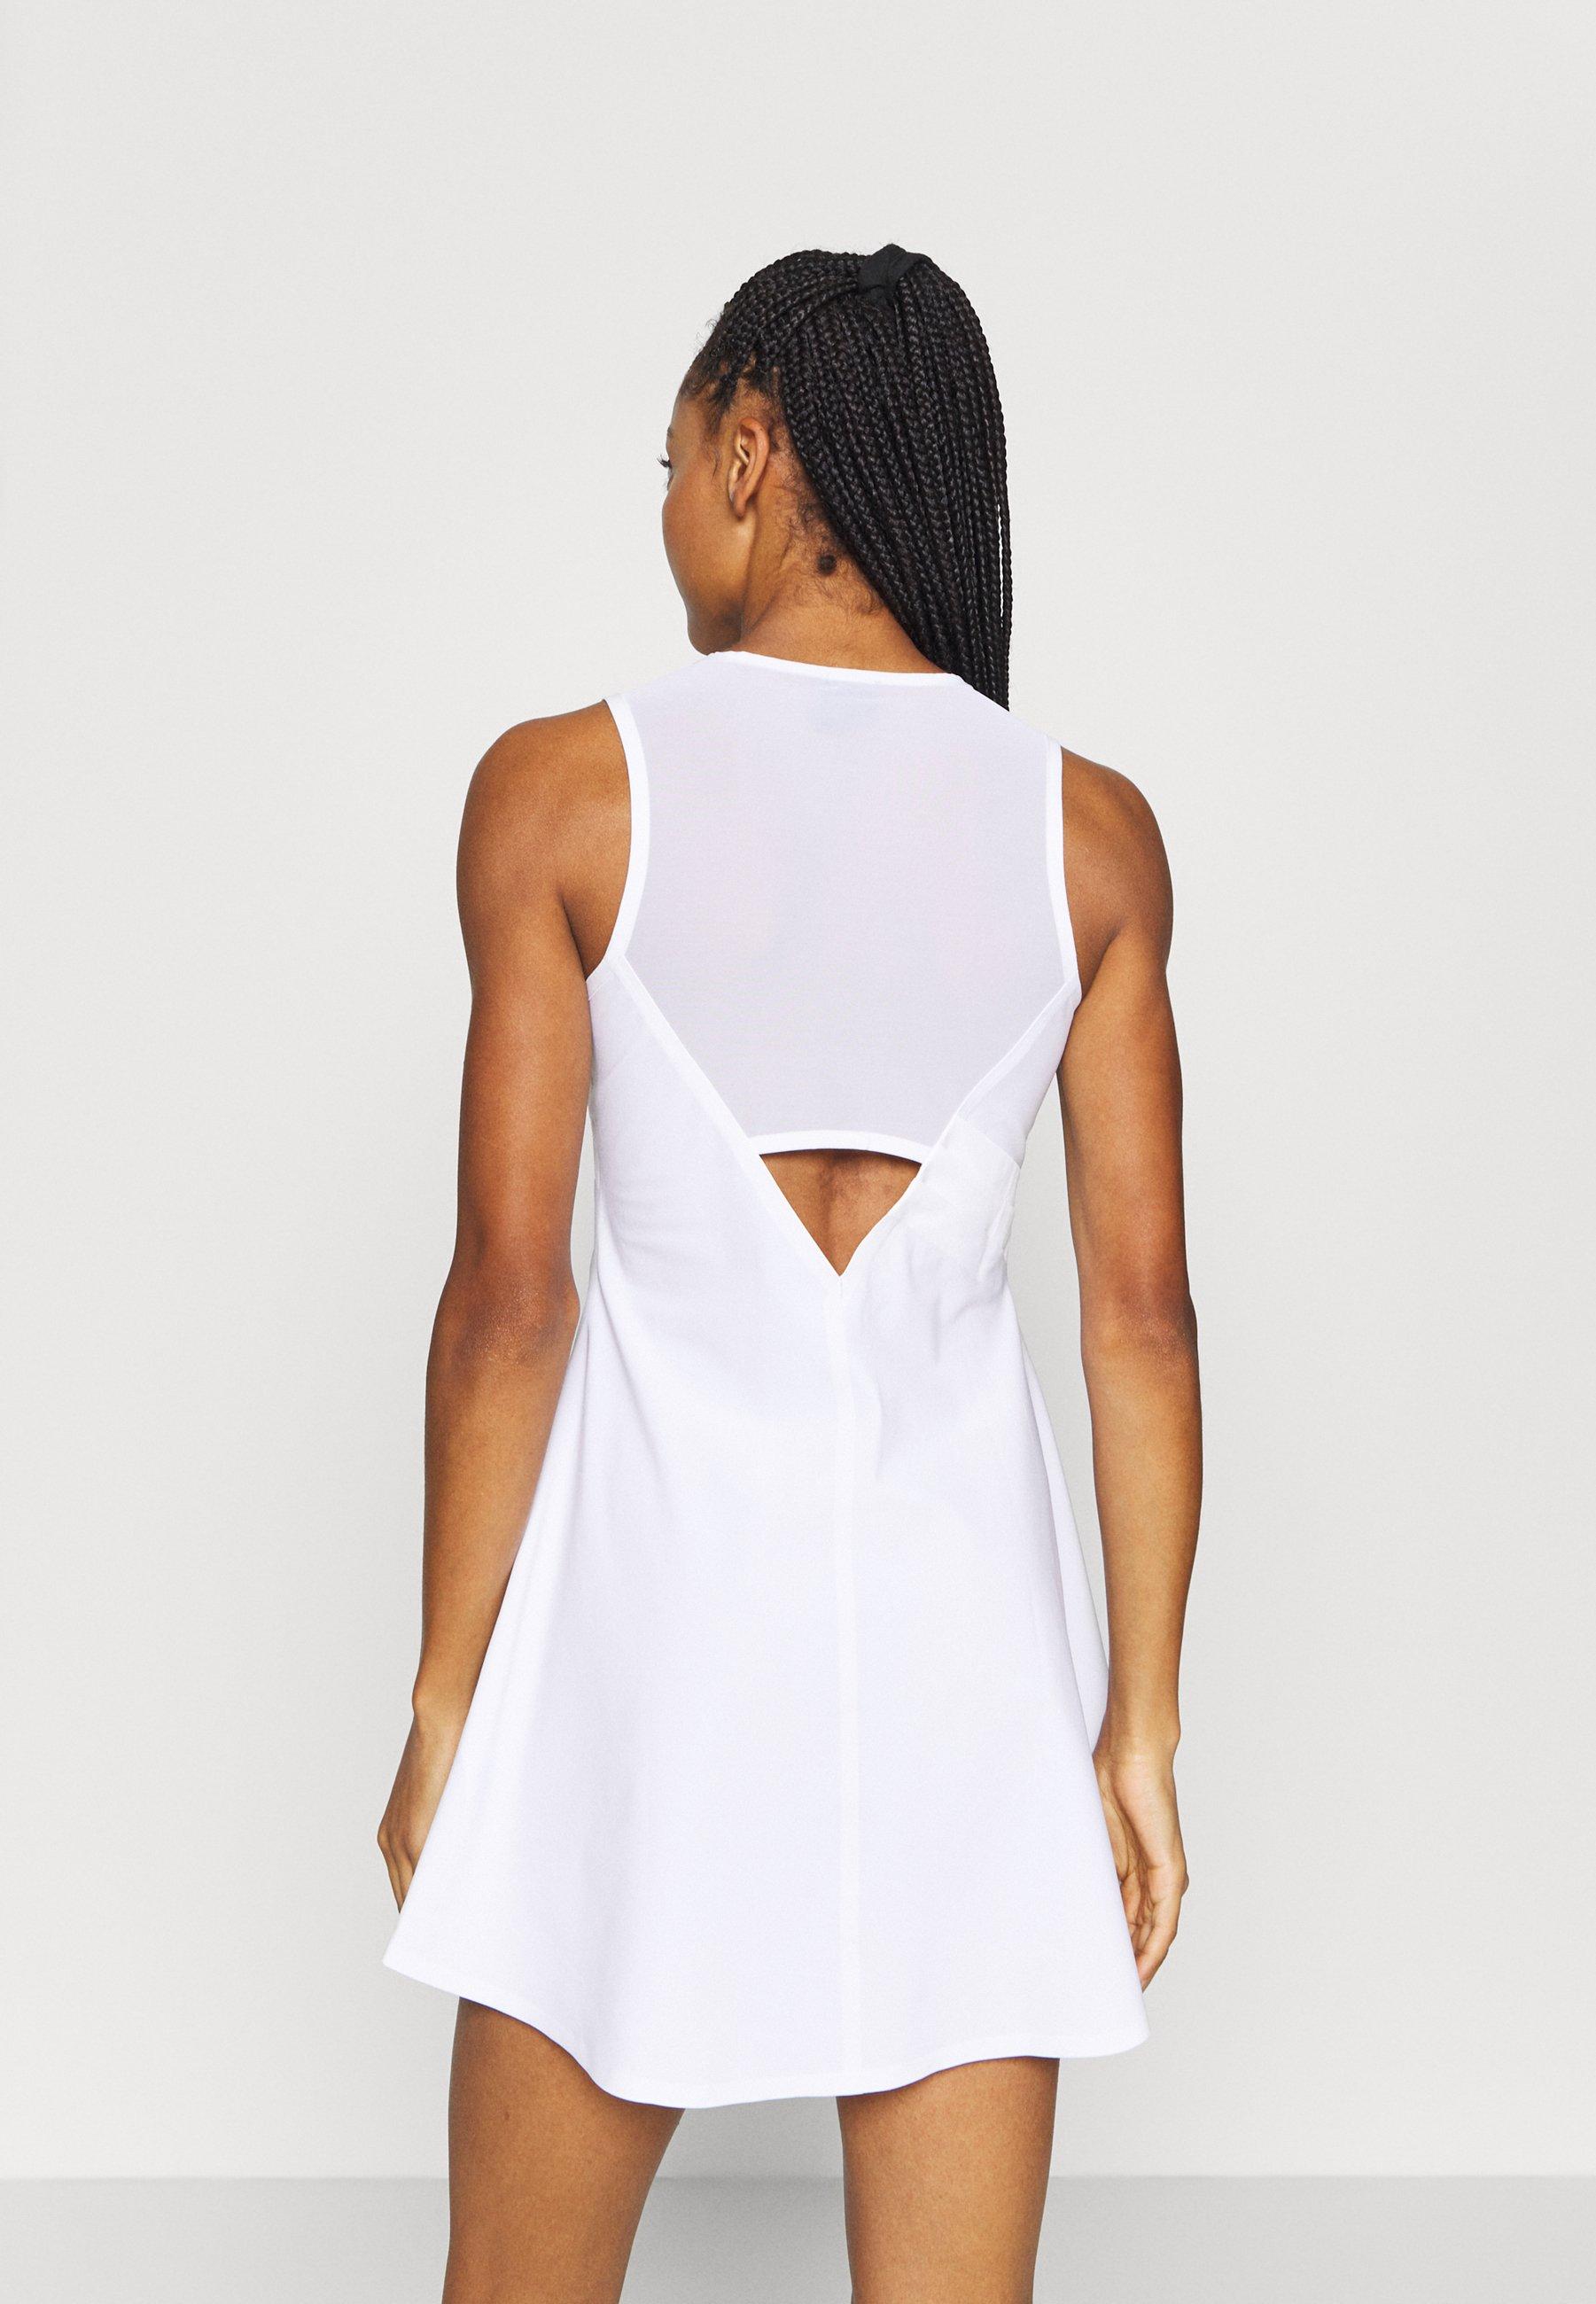 Compras Geniales Ropa de mujer Nike Performance MARIA DRESS Vestido de deporte white/black zb6zbS